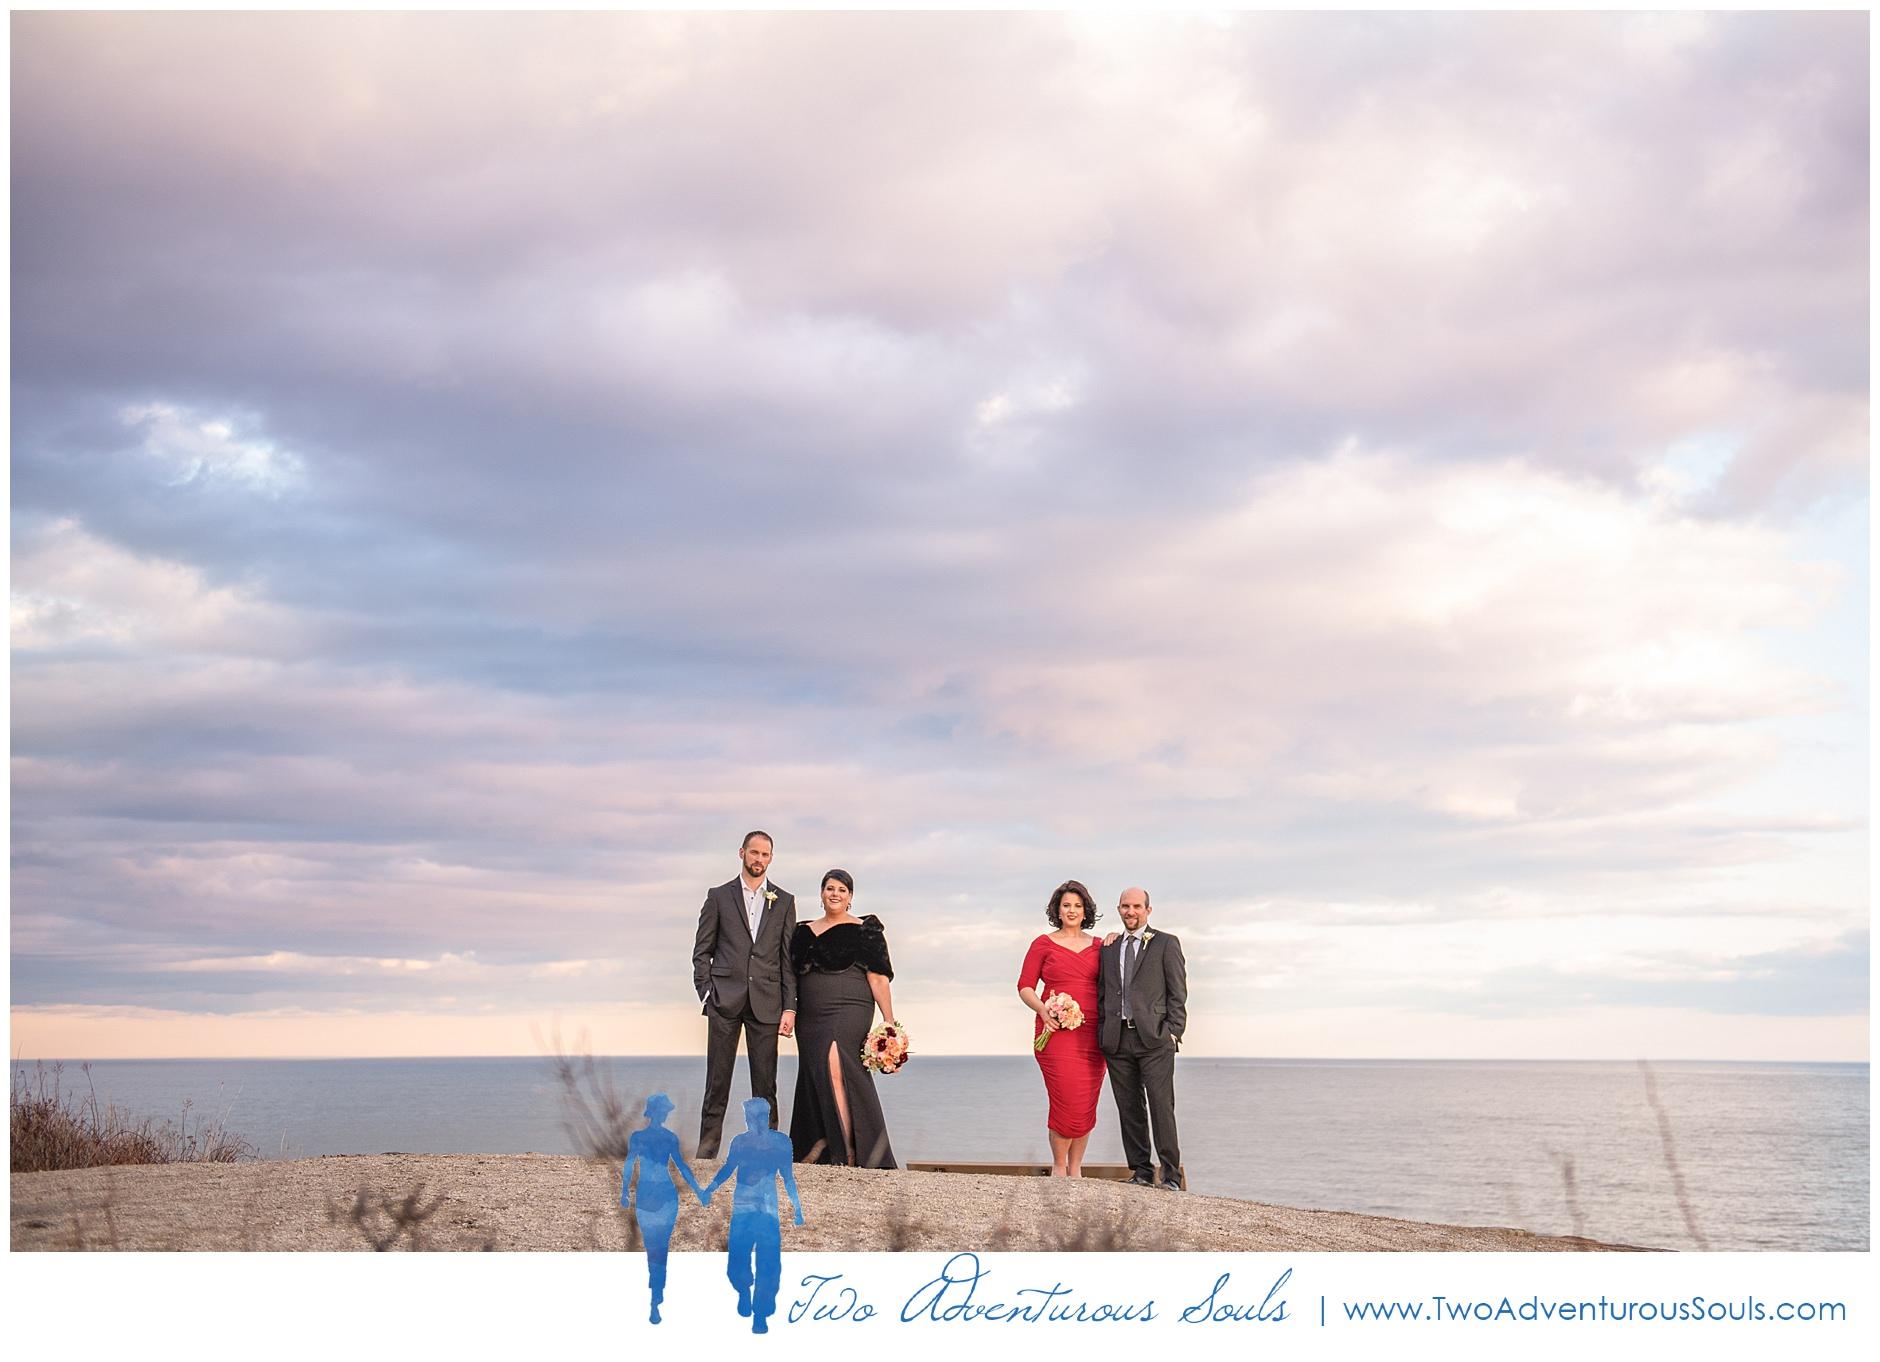 Inn by The Sea Elopement, Maine Elopement Photographer, Maine Wedding Photographers, Two Adventurous Souls_040619_0026.jpg